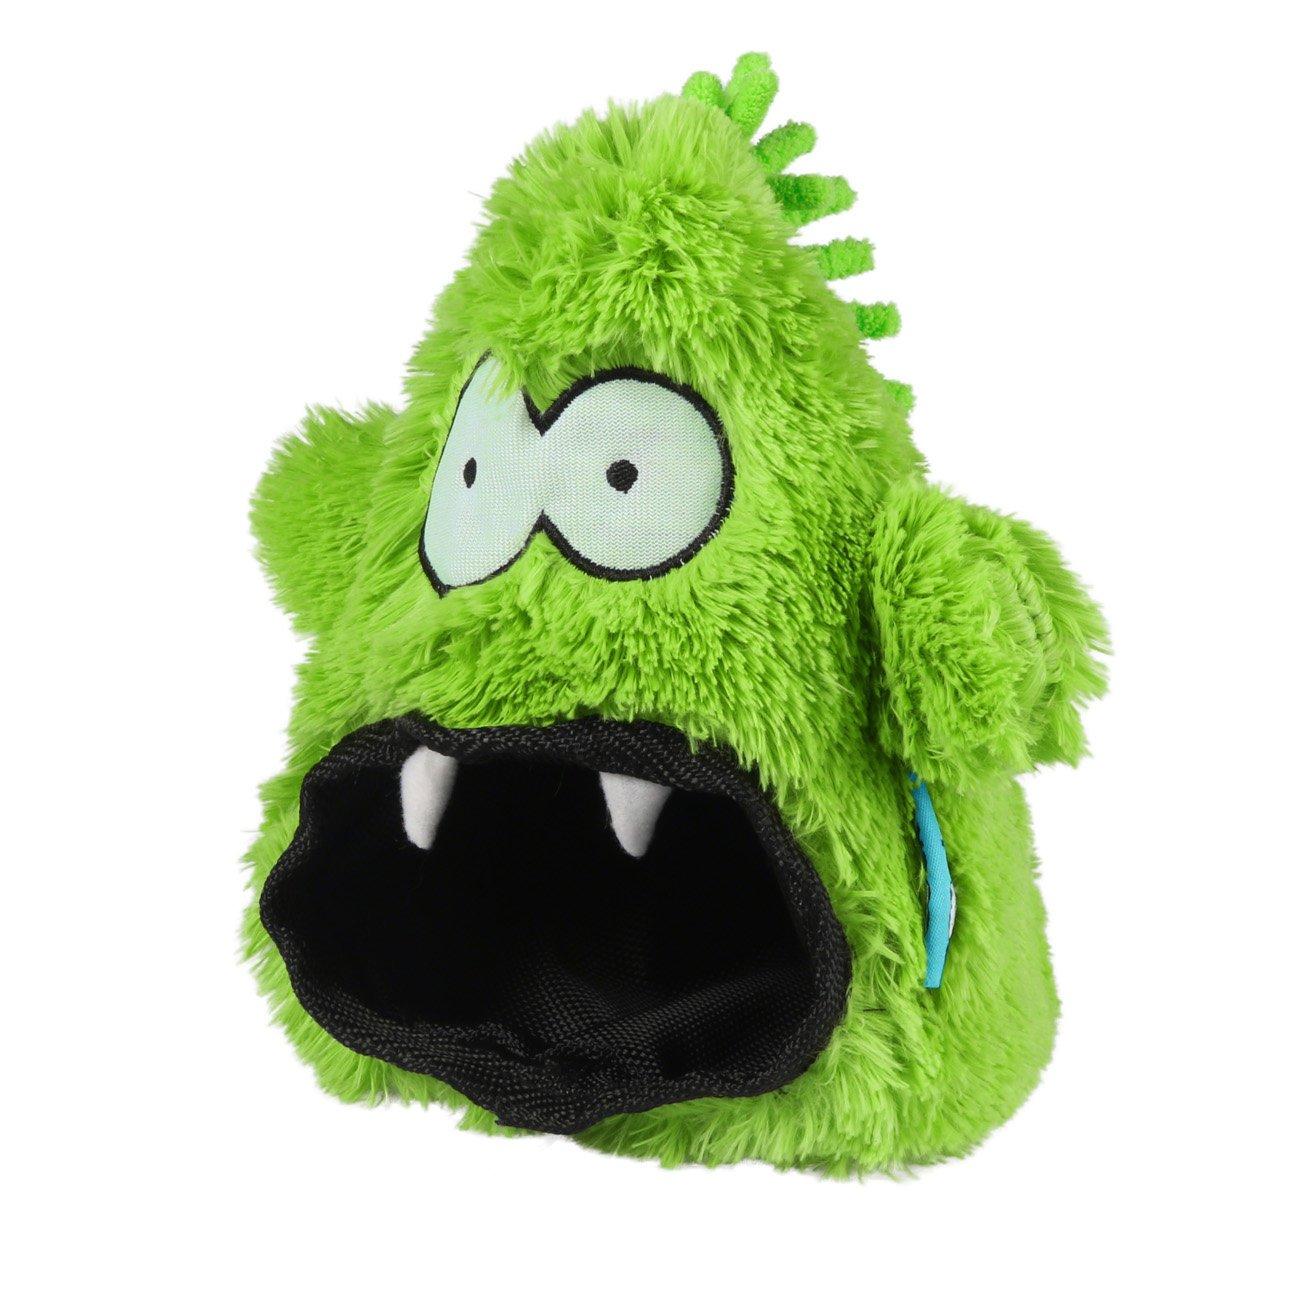 Coockoo Plüsch Monster Hundespielzeug, Bild 9